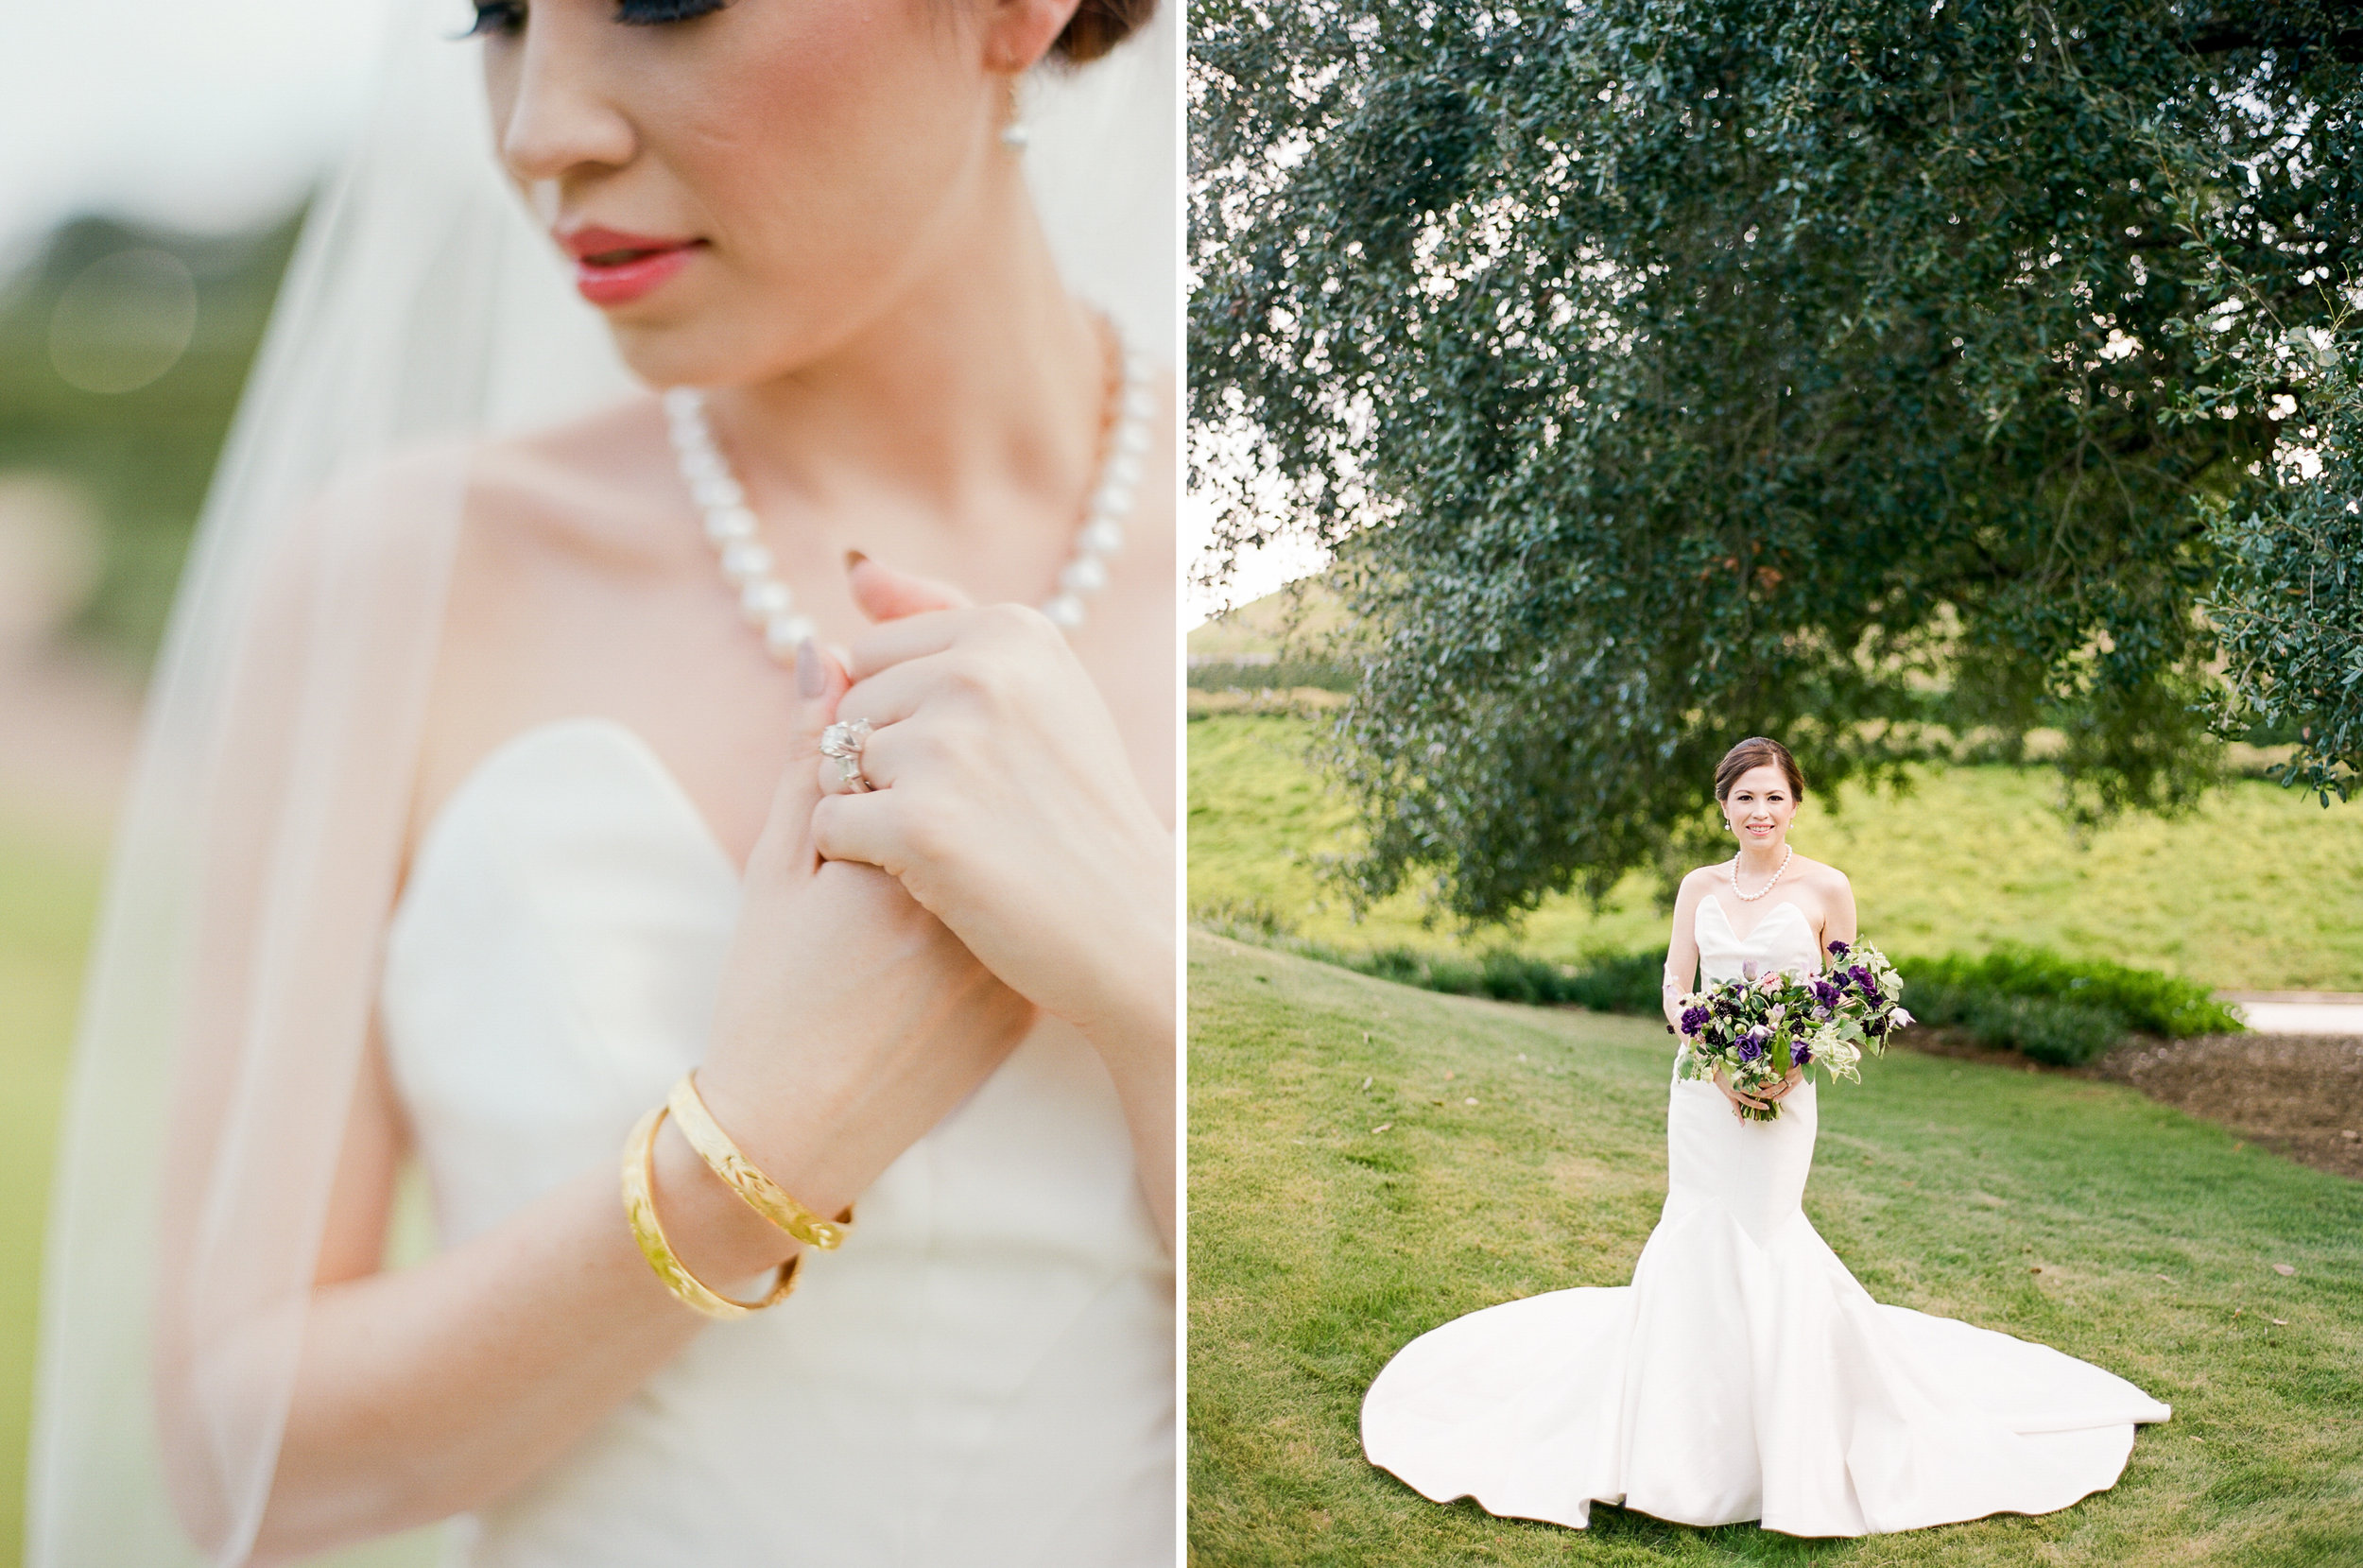 mcgovern-centennial-gardens-wedding-houston-wedding-photographer-bridals-film-austin-wedding-photographer-101.jpg